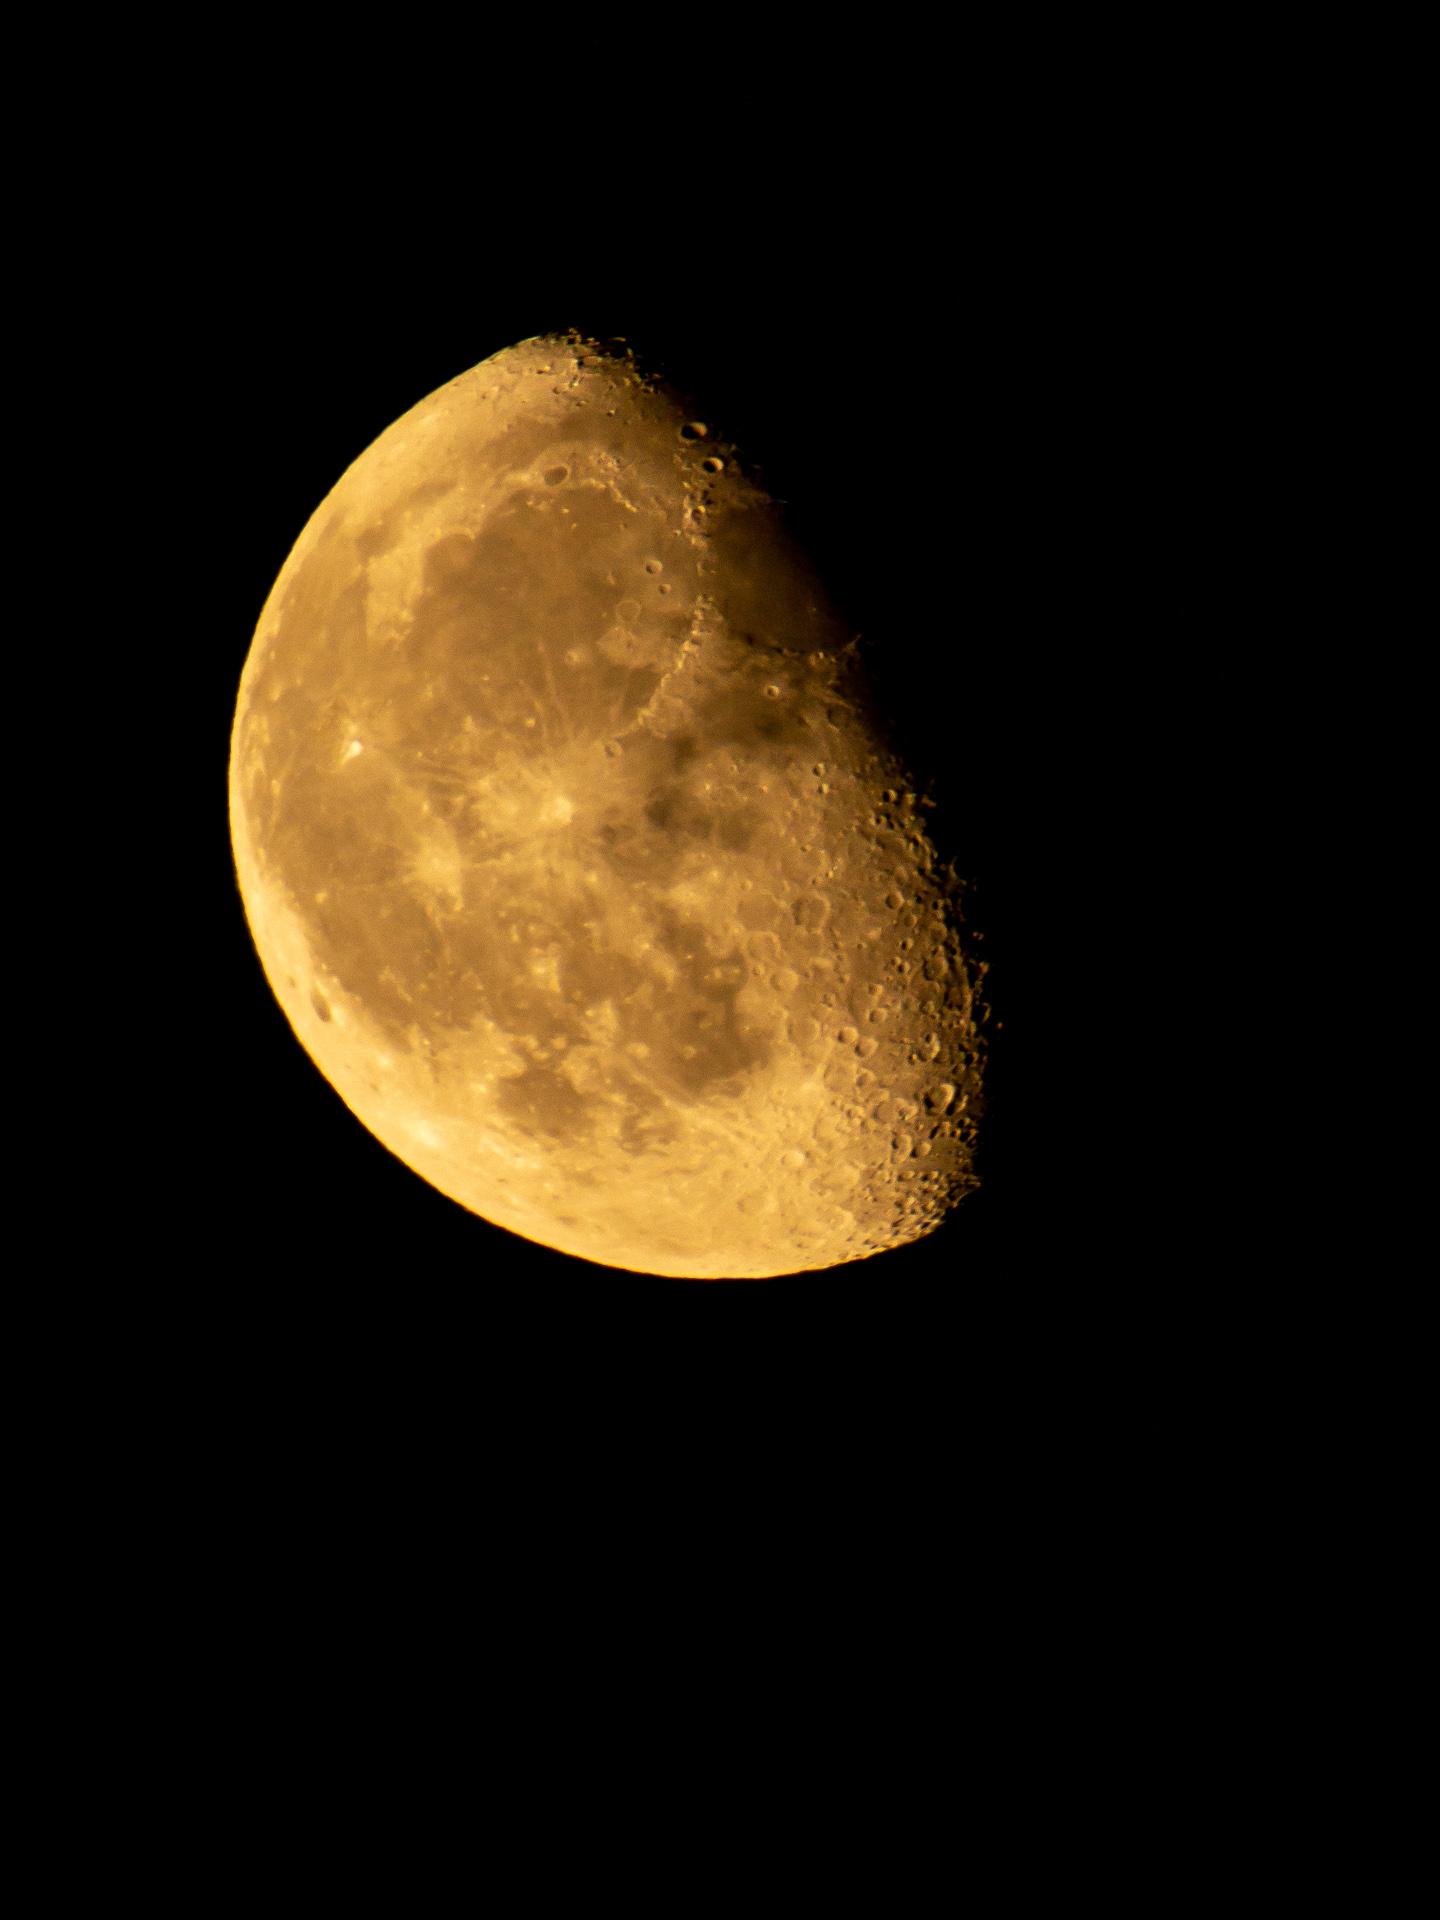 Waning Gibbous Moon | 20190623 0140 E:38.96x77.00@84m